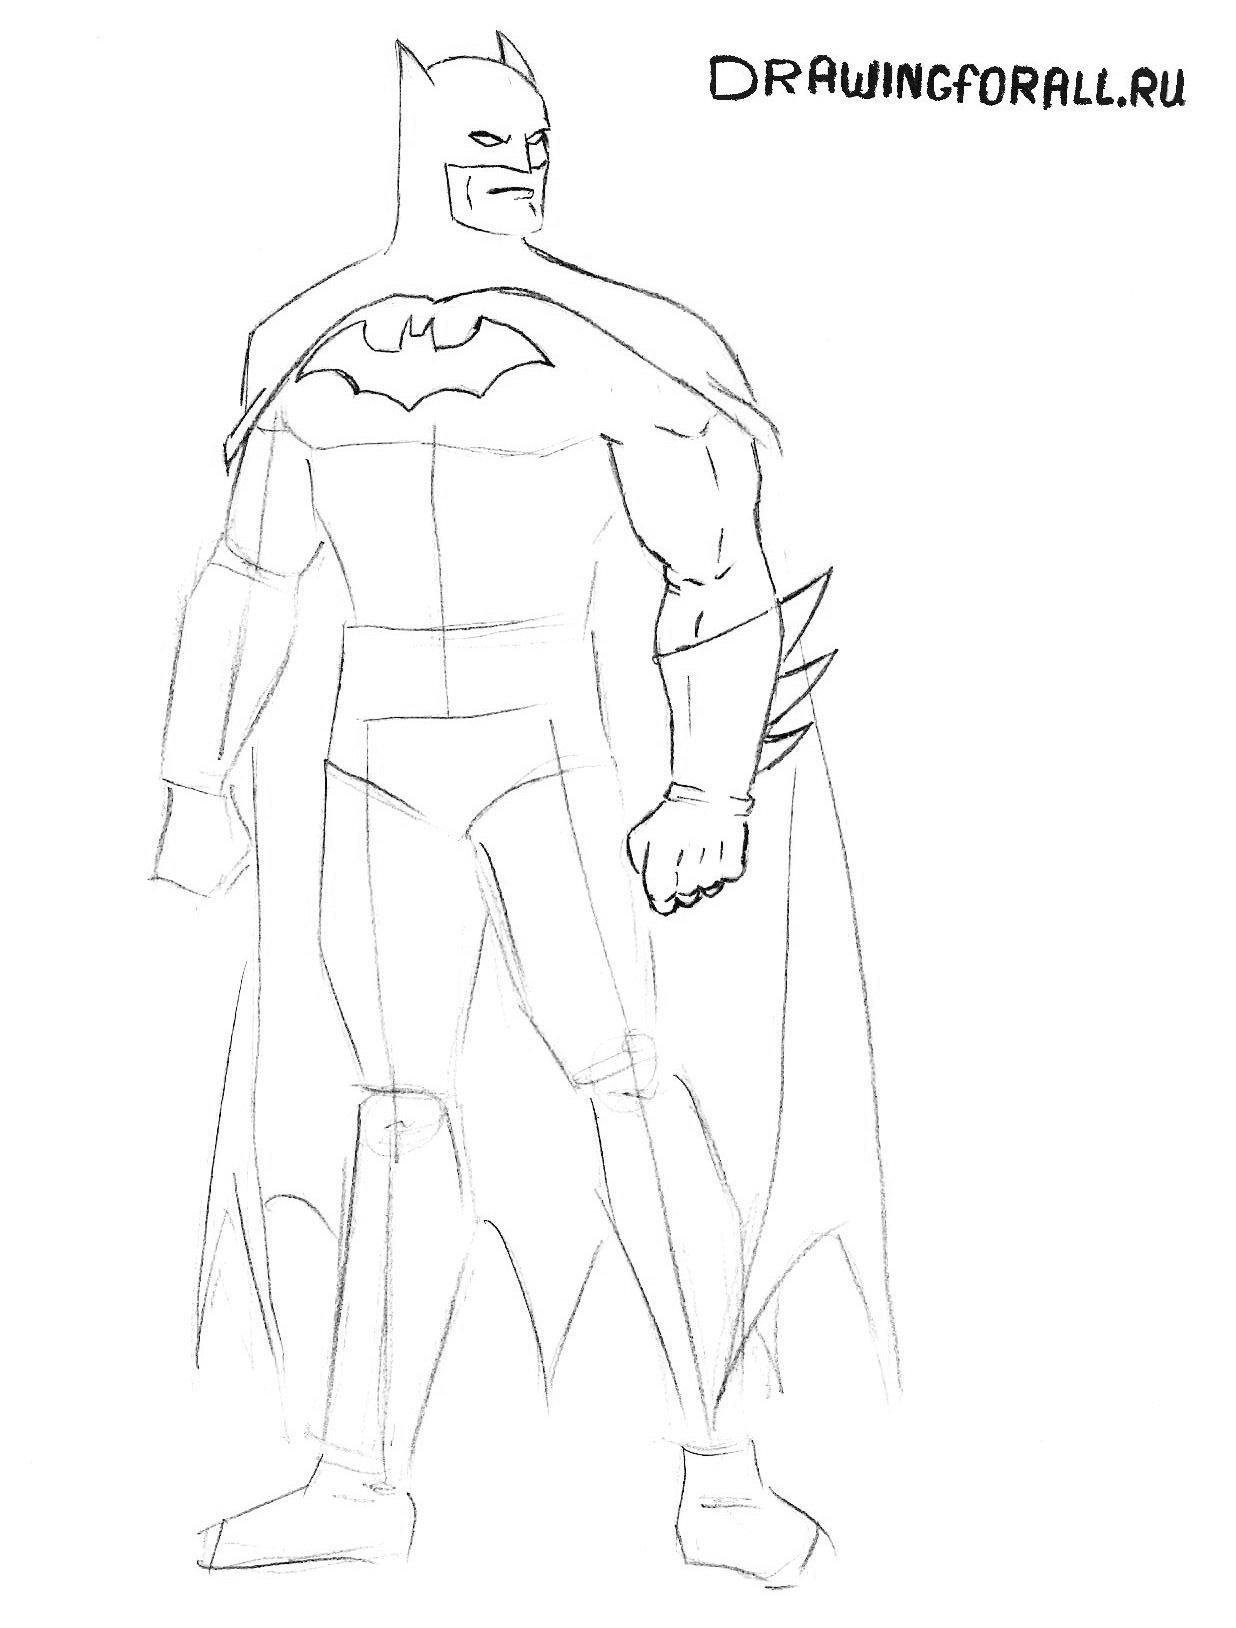 как нарисовать бэтмена карандашом поэтапно